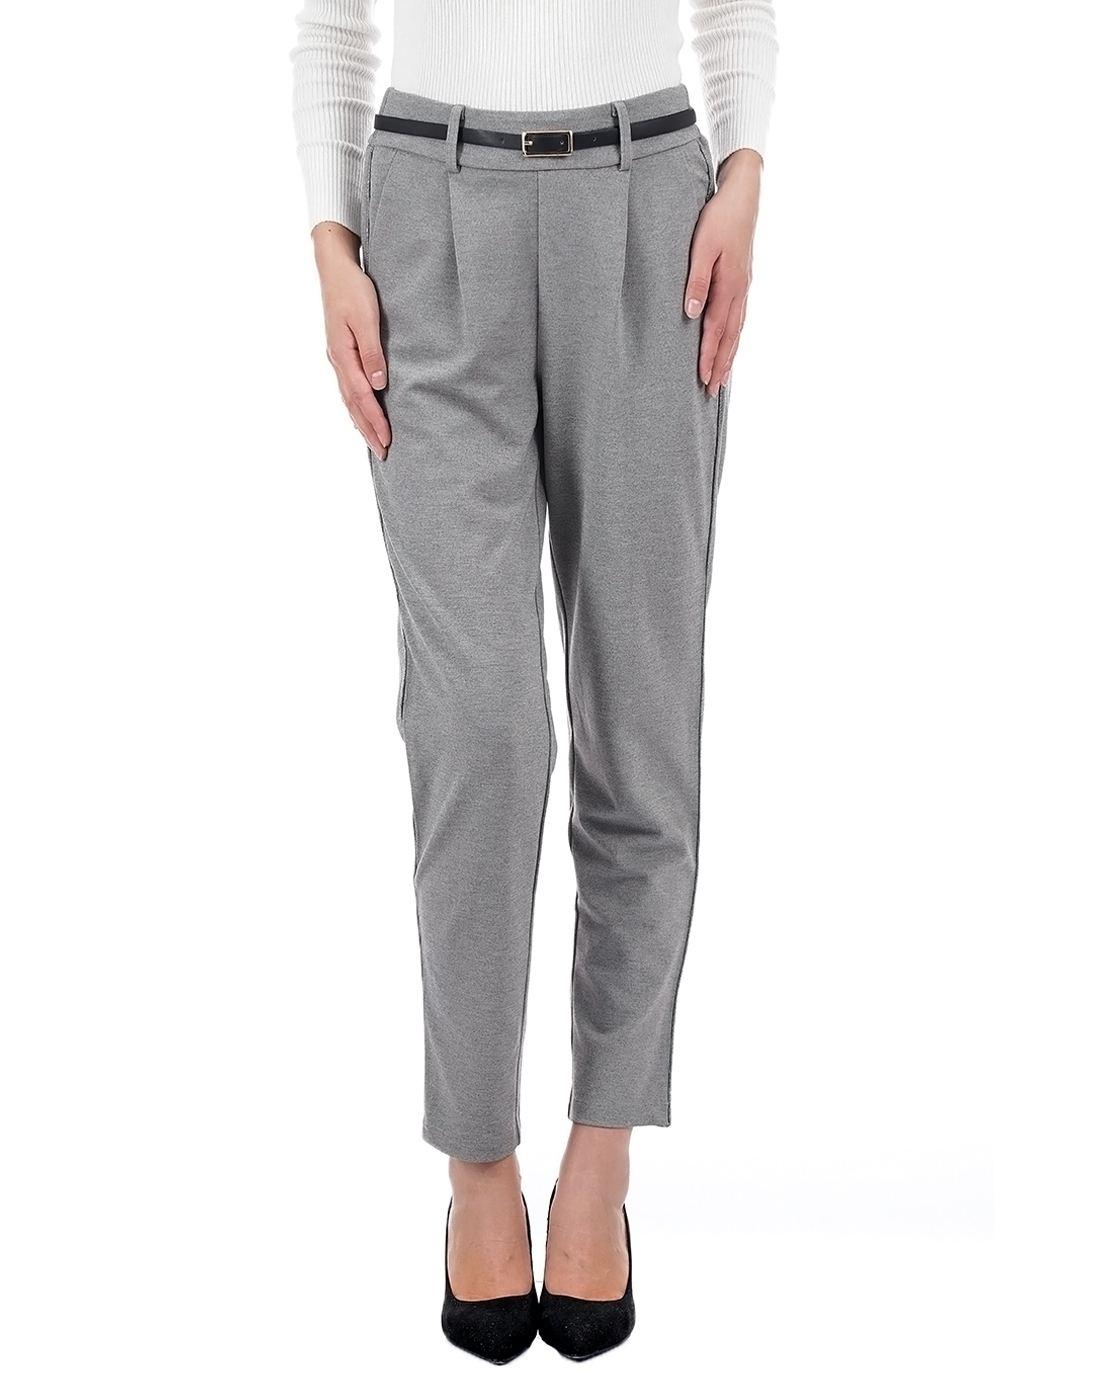 Vero Moda Women Grey Pant